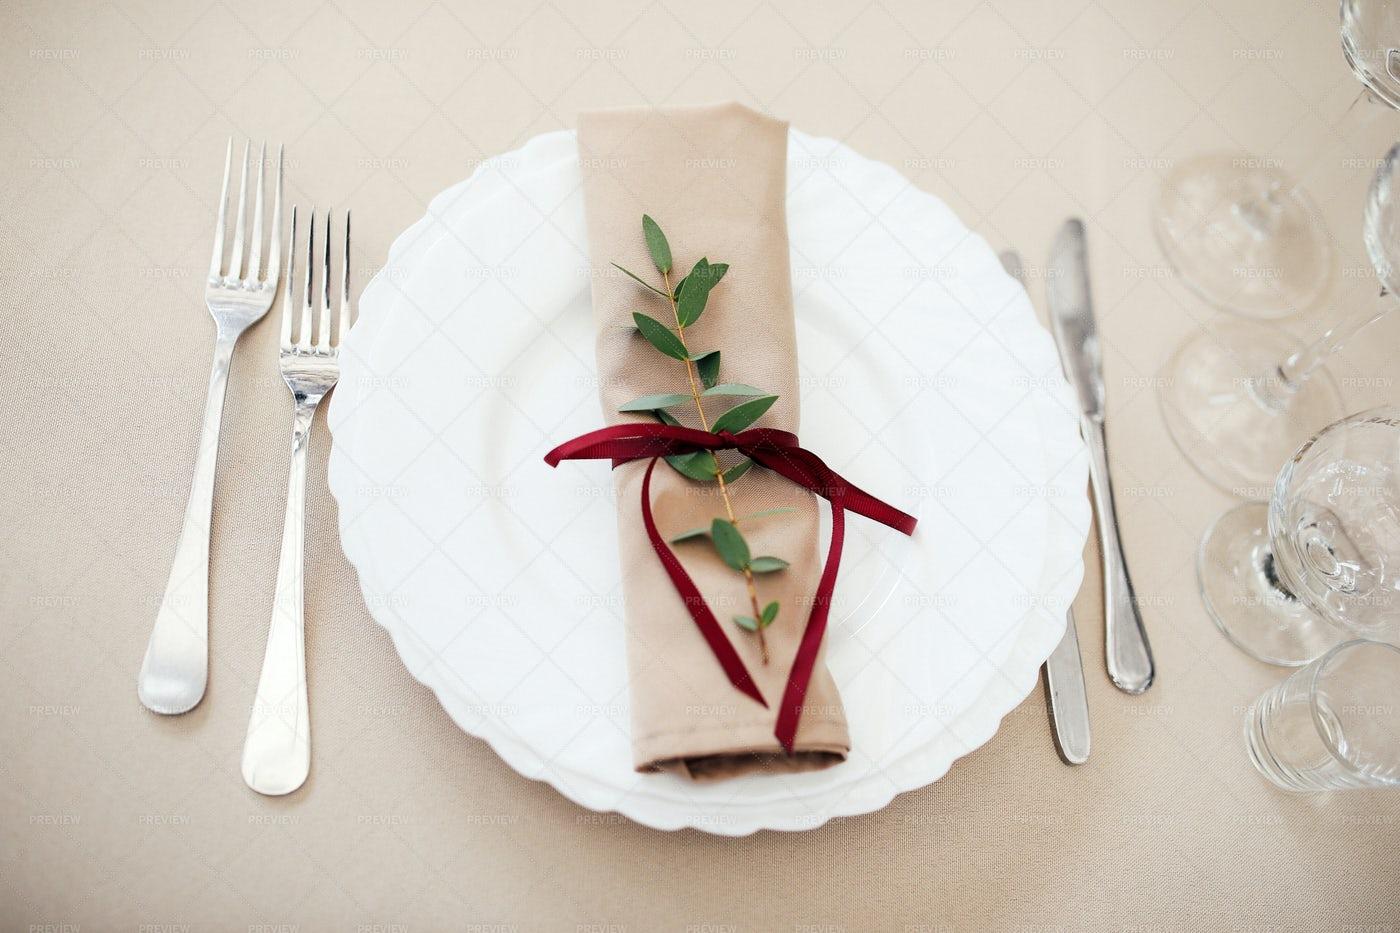 A Wedding Plate Set Up: Stock Photos